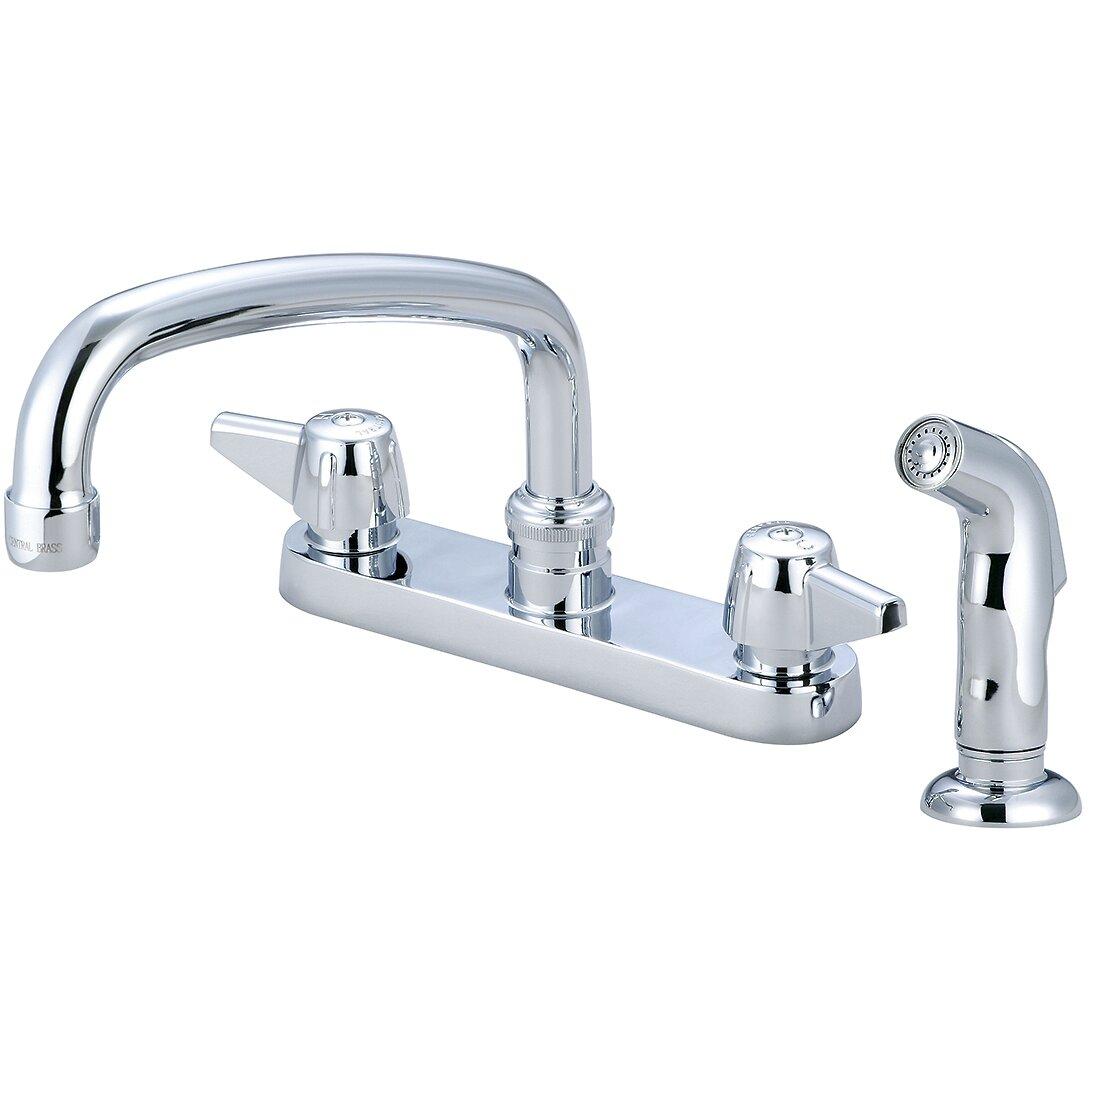 Double Handle Kitchen Faucet Central Brass Double Handle Centerset Kitchen Faucet With Side